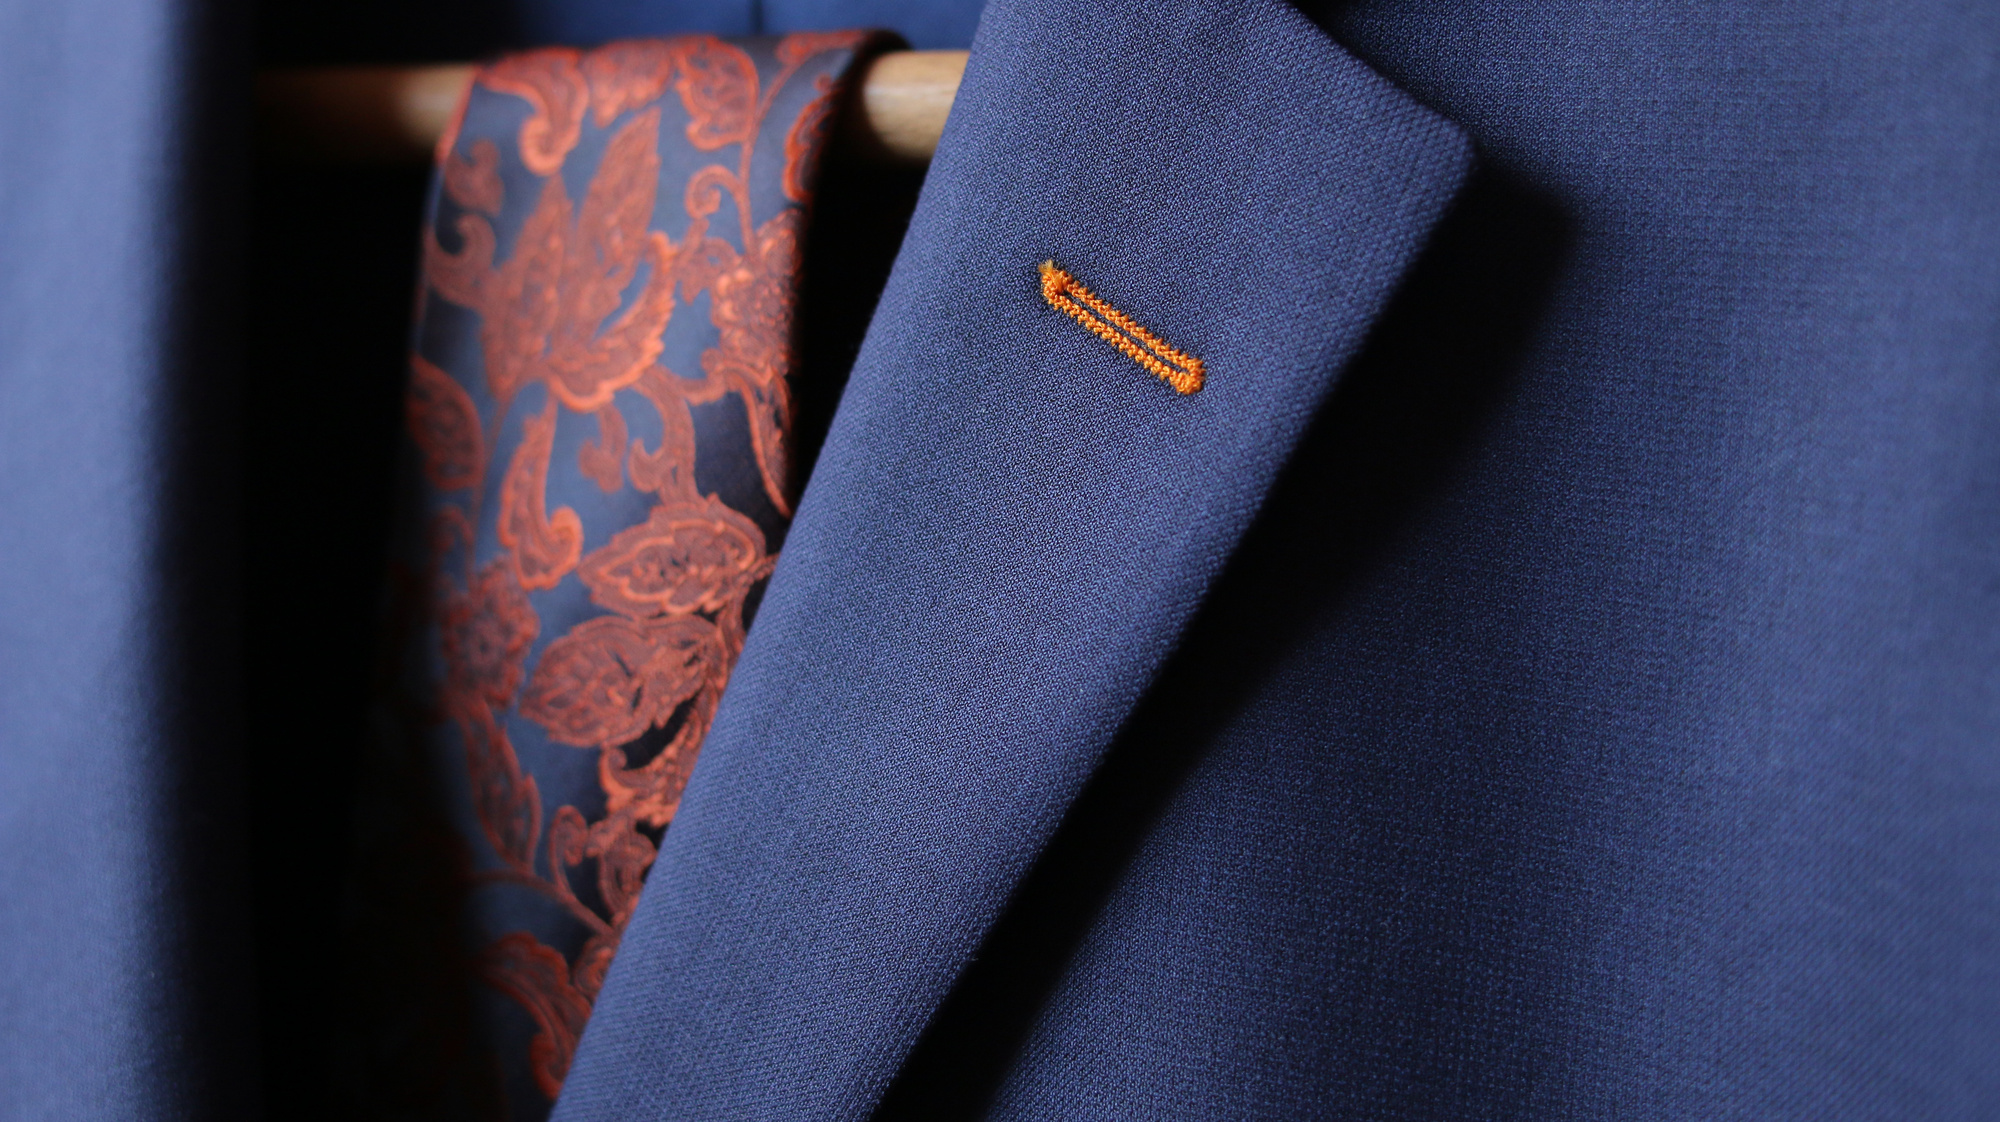 close-up of suit jacket lapel button hole fabric